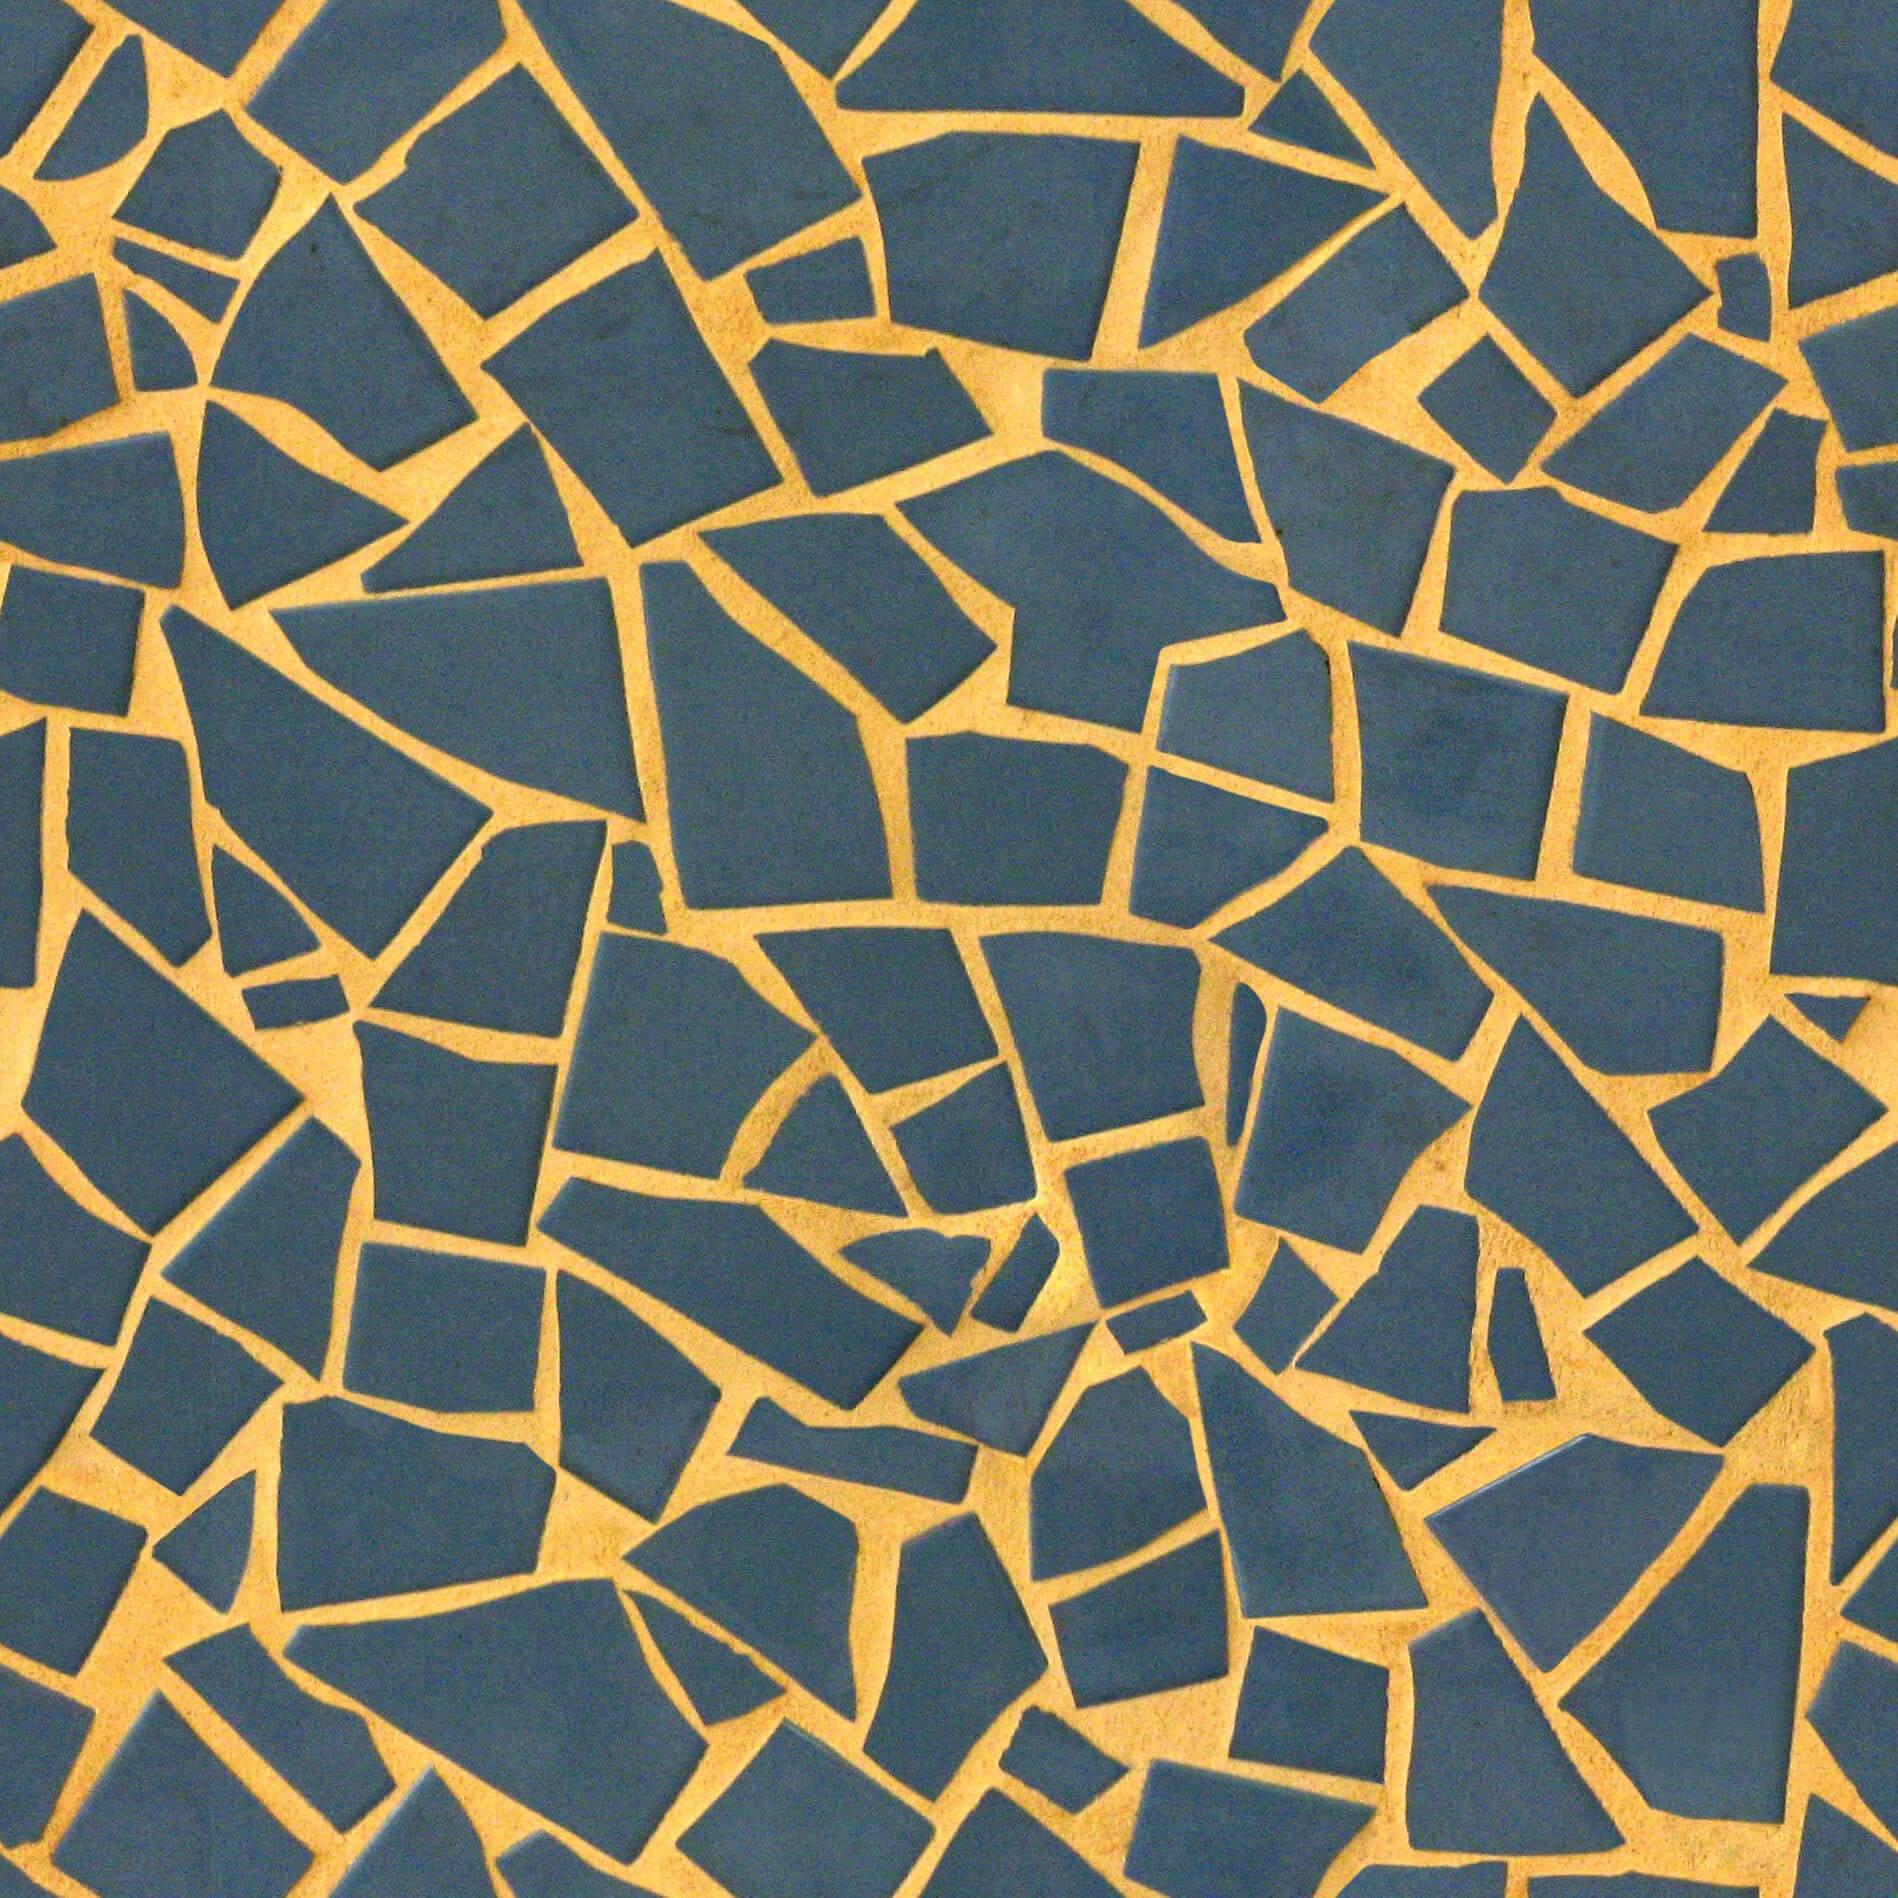 Free Seamless Textures Broken Shattered Tiles Arranged